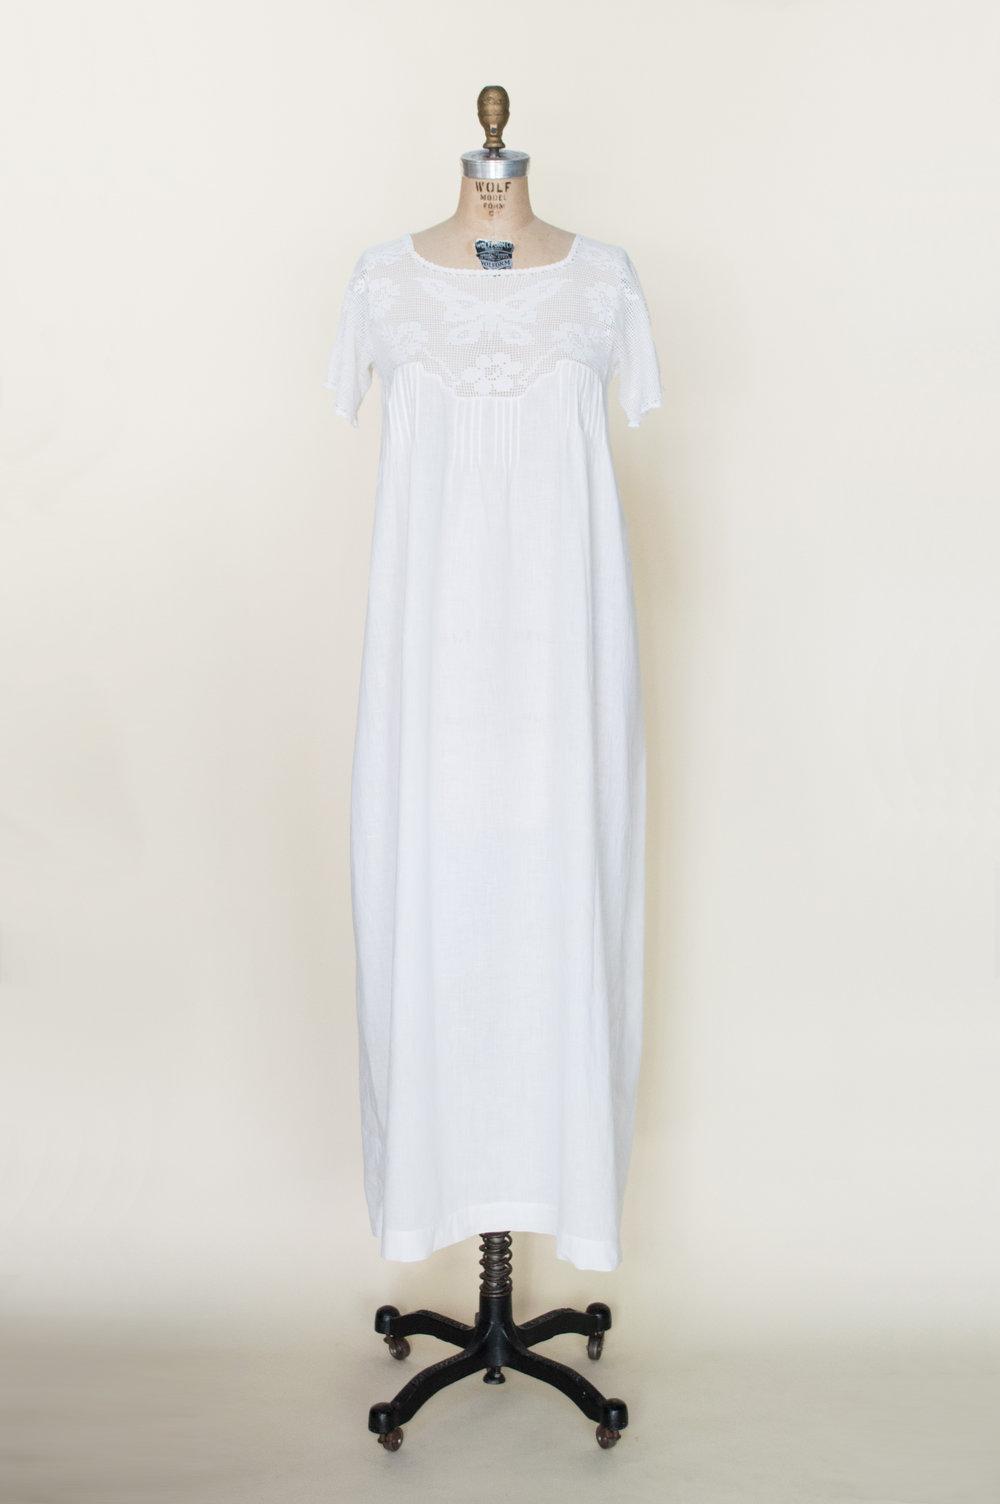 Edwardian Nightgown